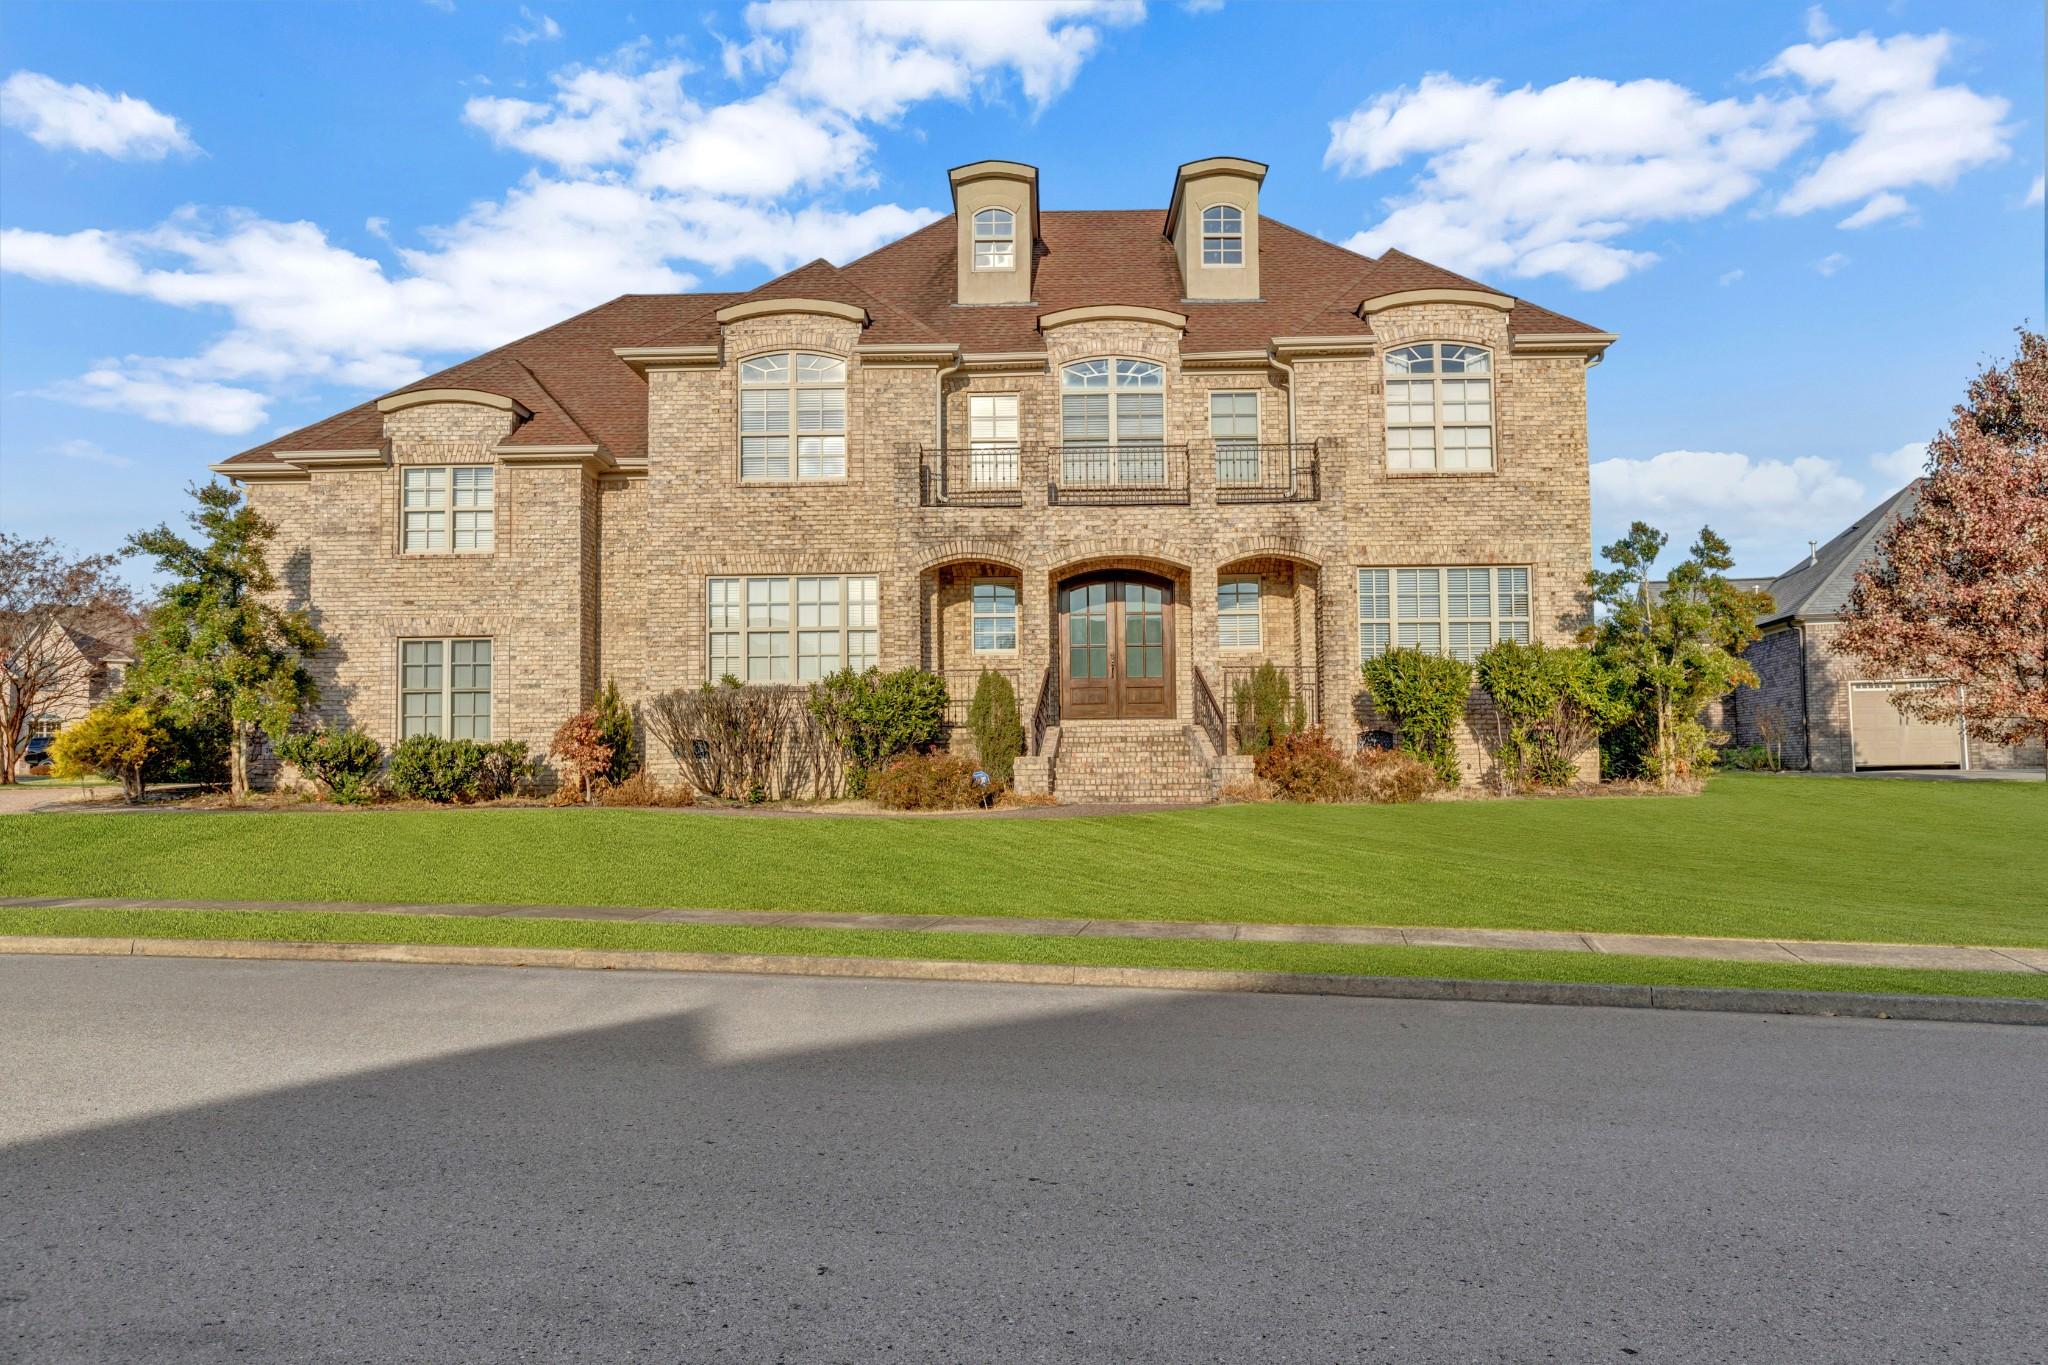 1083 Gadwall Cir, Hendersonville, TN 37075 - Hendersonville, TN real estate listing